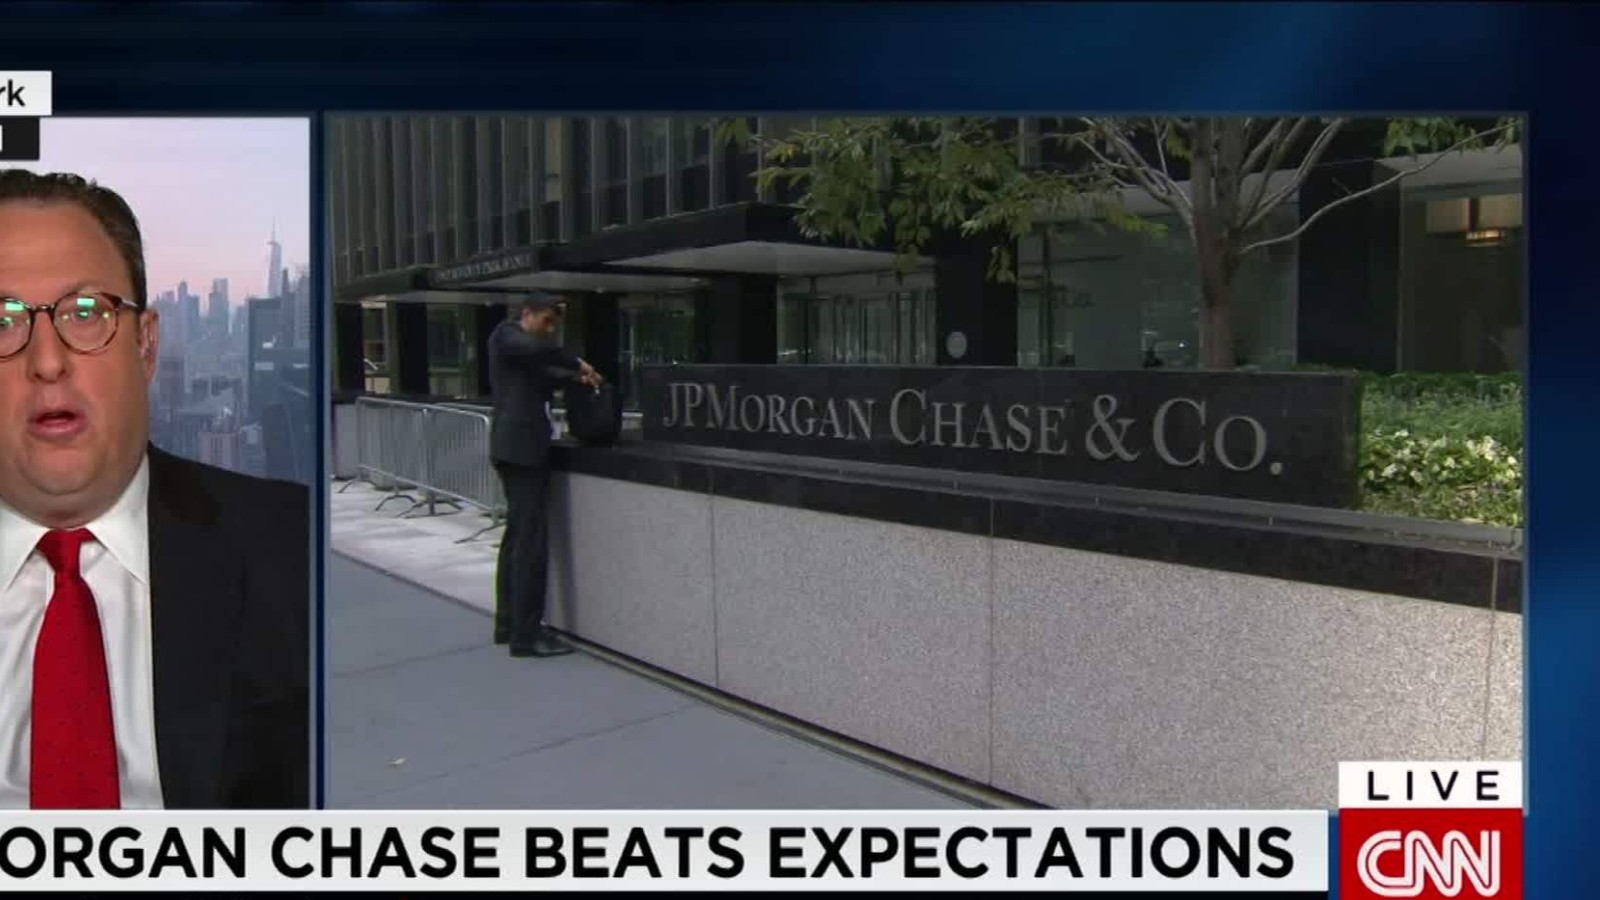 JPMorgan Chase beats expectations - CNN Video